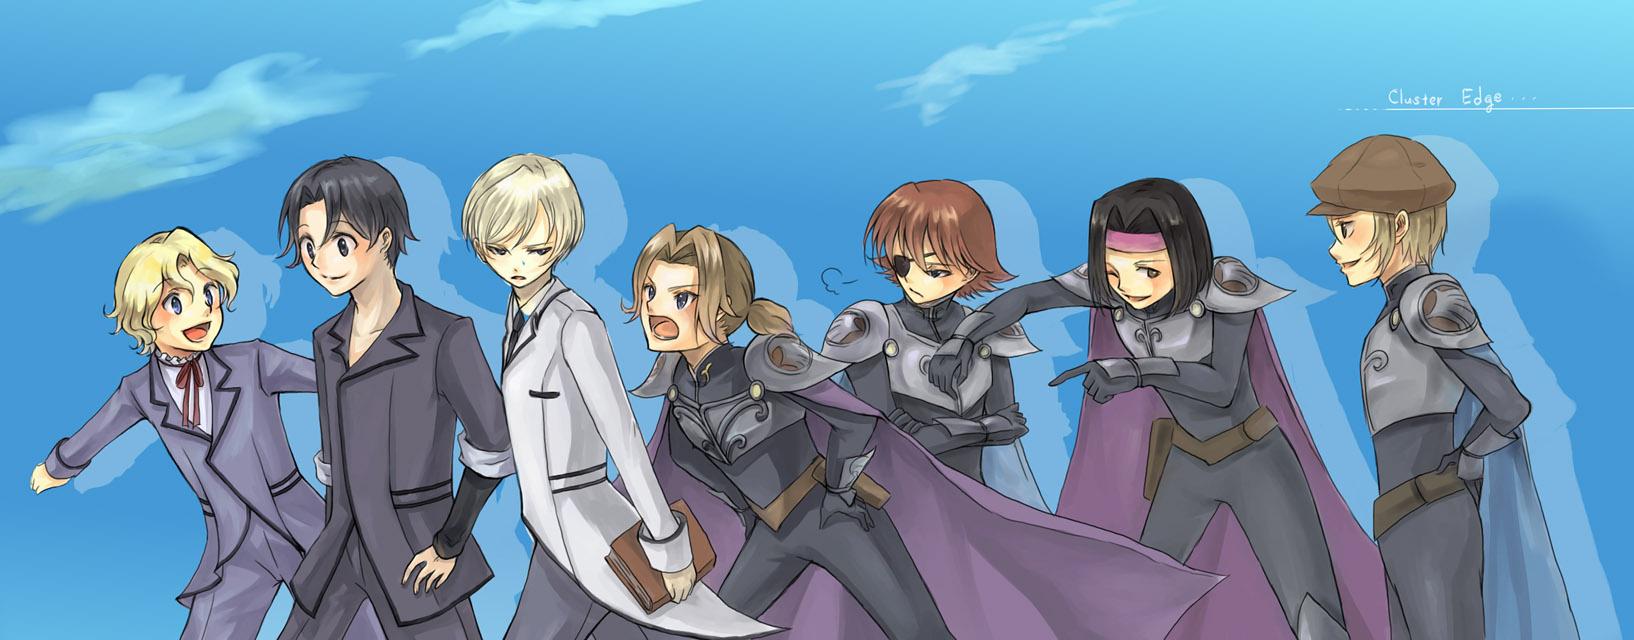 Cluster Edge - Zerochan Anime ...